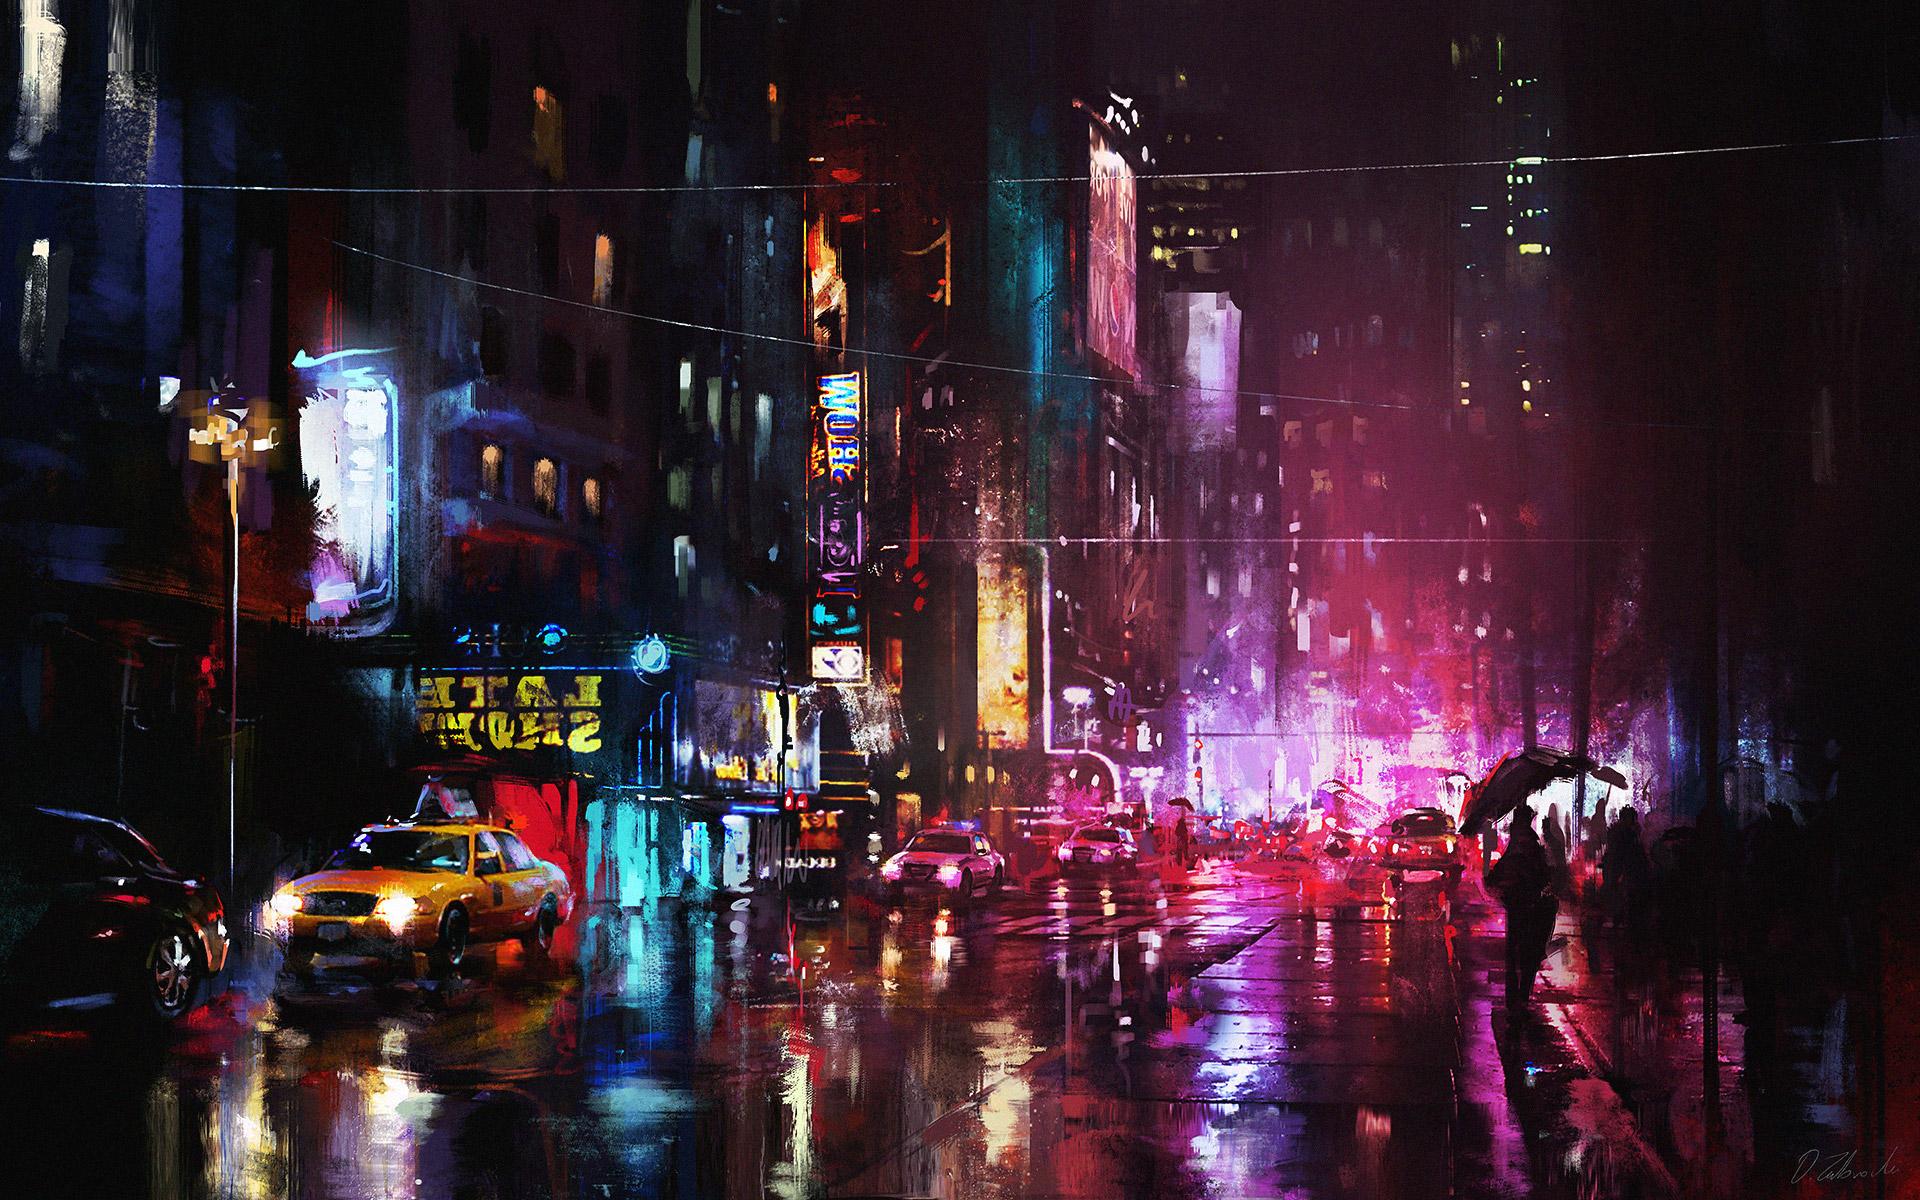 http://orig08.deviantart.net/6b71/f/2014/154/4/3/red_lights_by_daroz-d7kuqyu.jpg